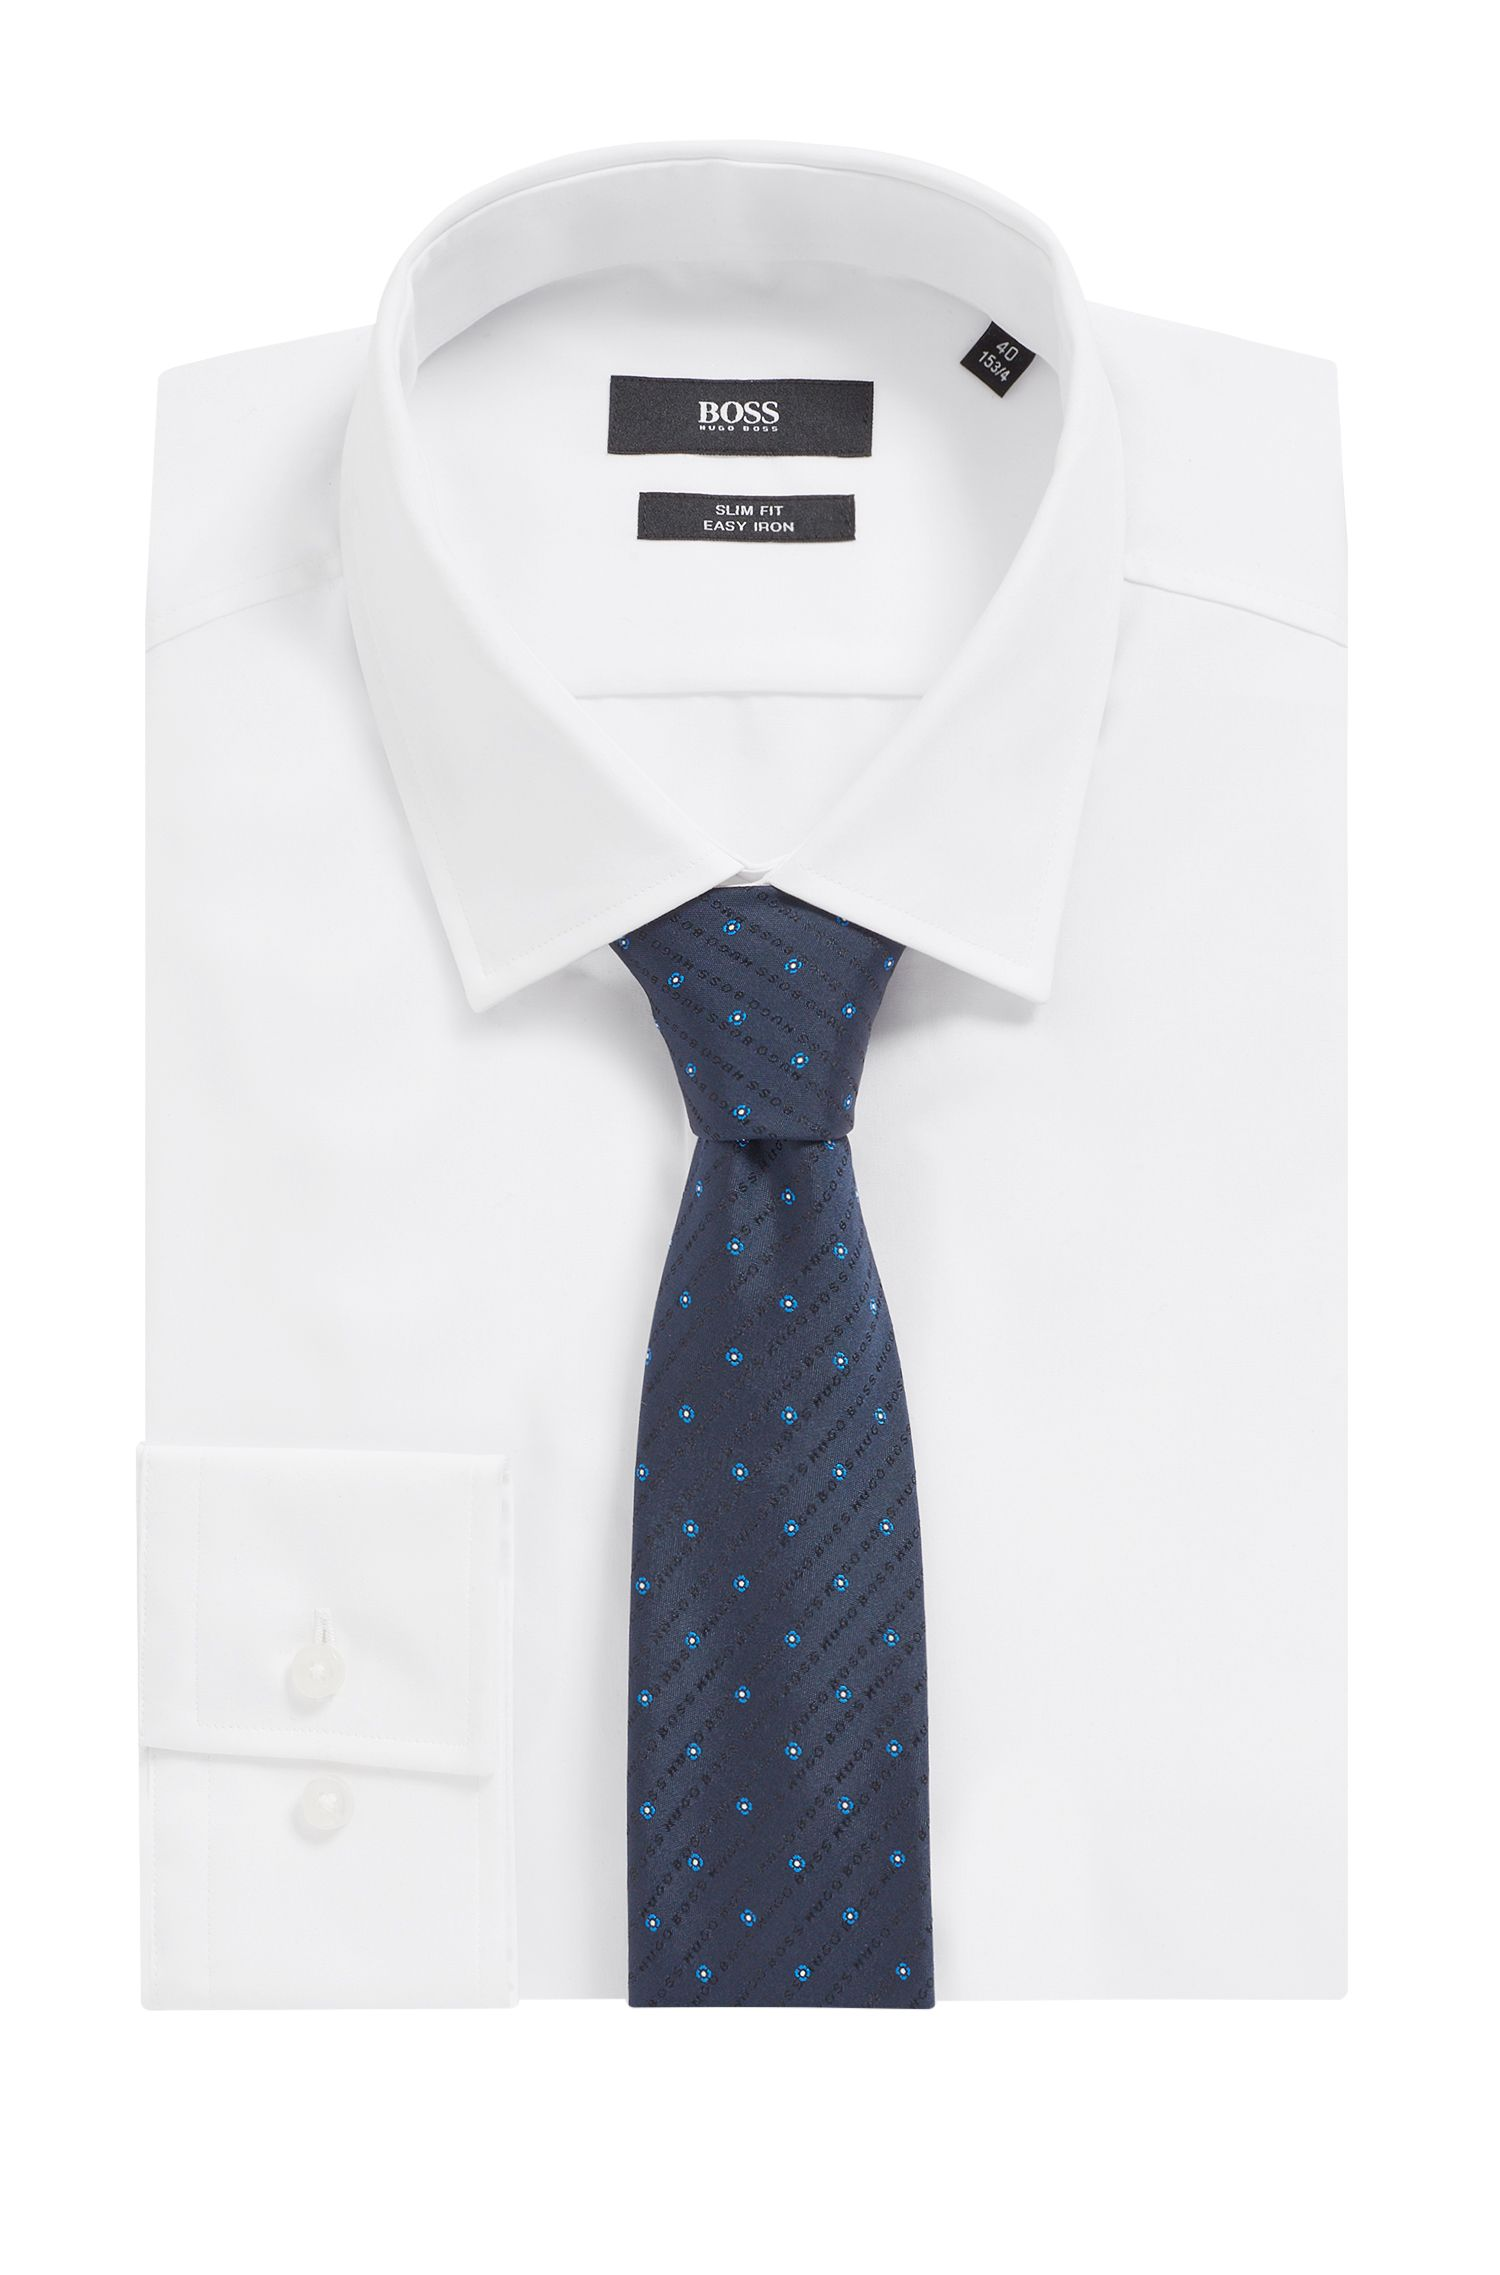 Cravatta in seta jacquard a motivi con logo, Blu scuro